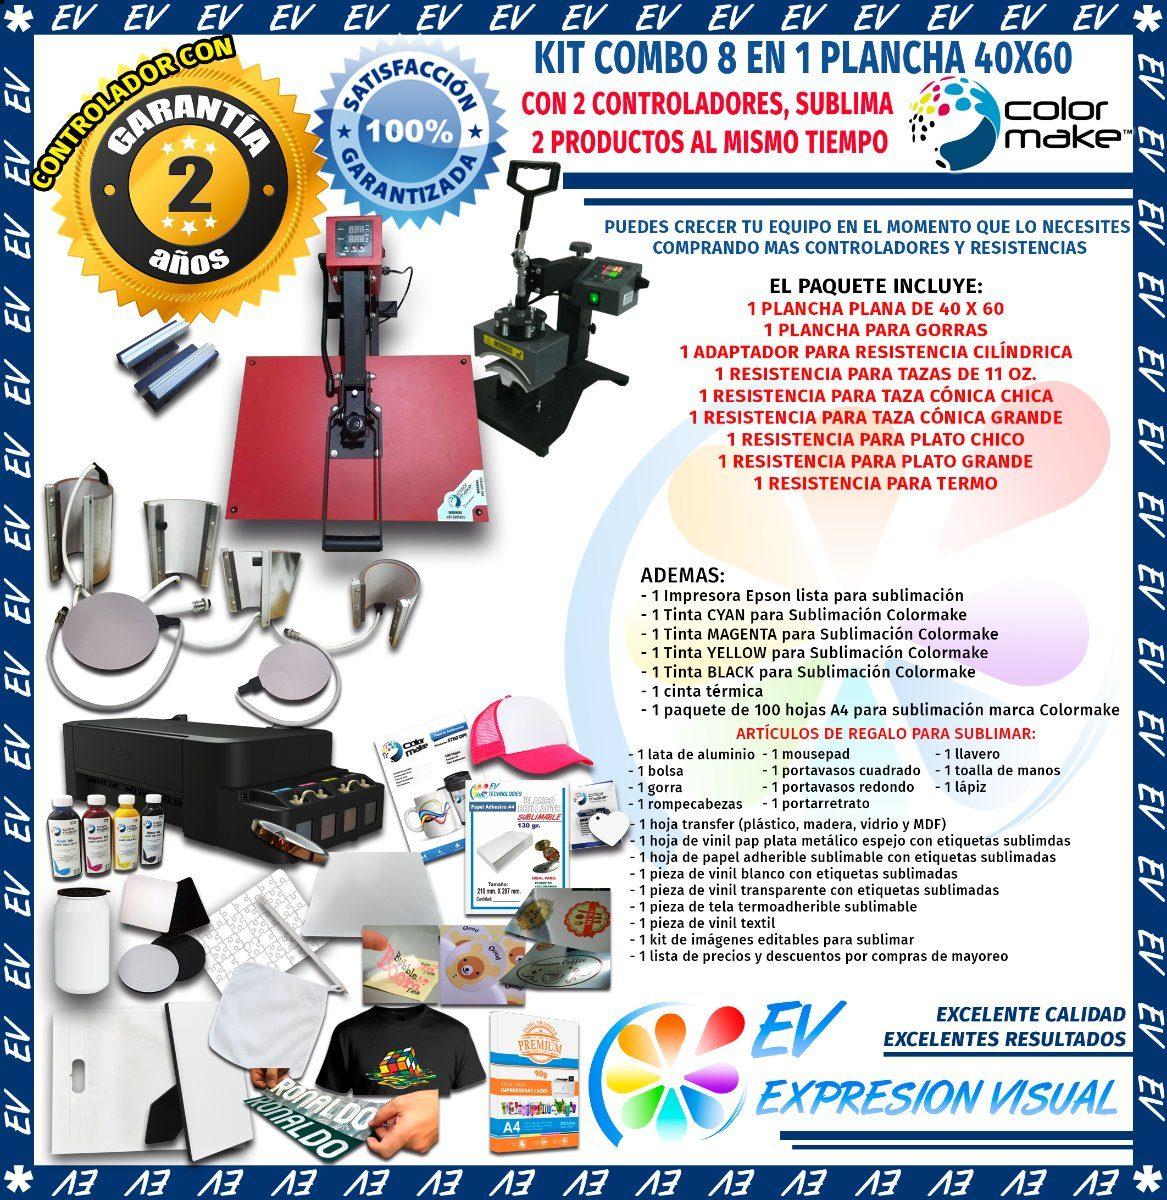 Kit Combo 8 En 1 Plancha 40x60 Colormake Sublimación 2 Cont ... 5ae9228219b9a